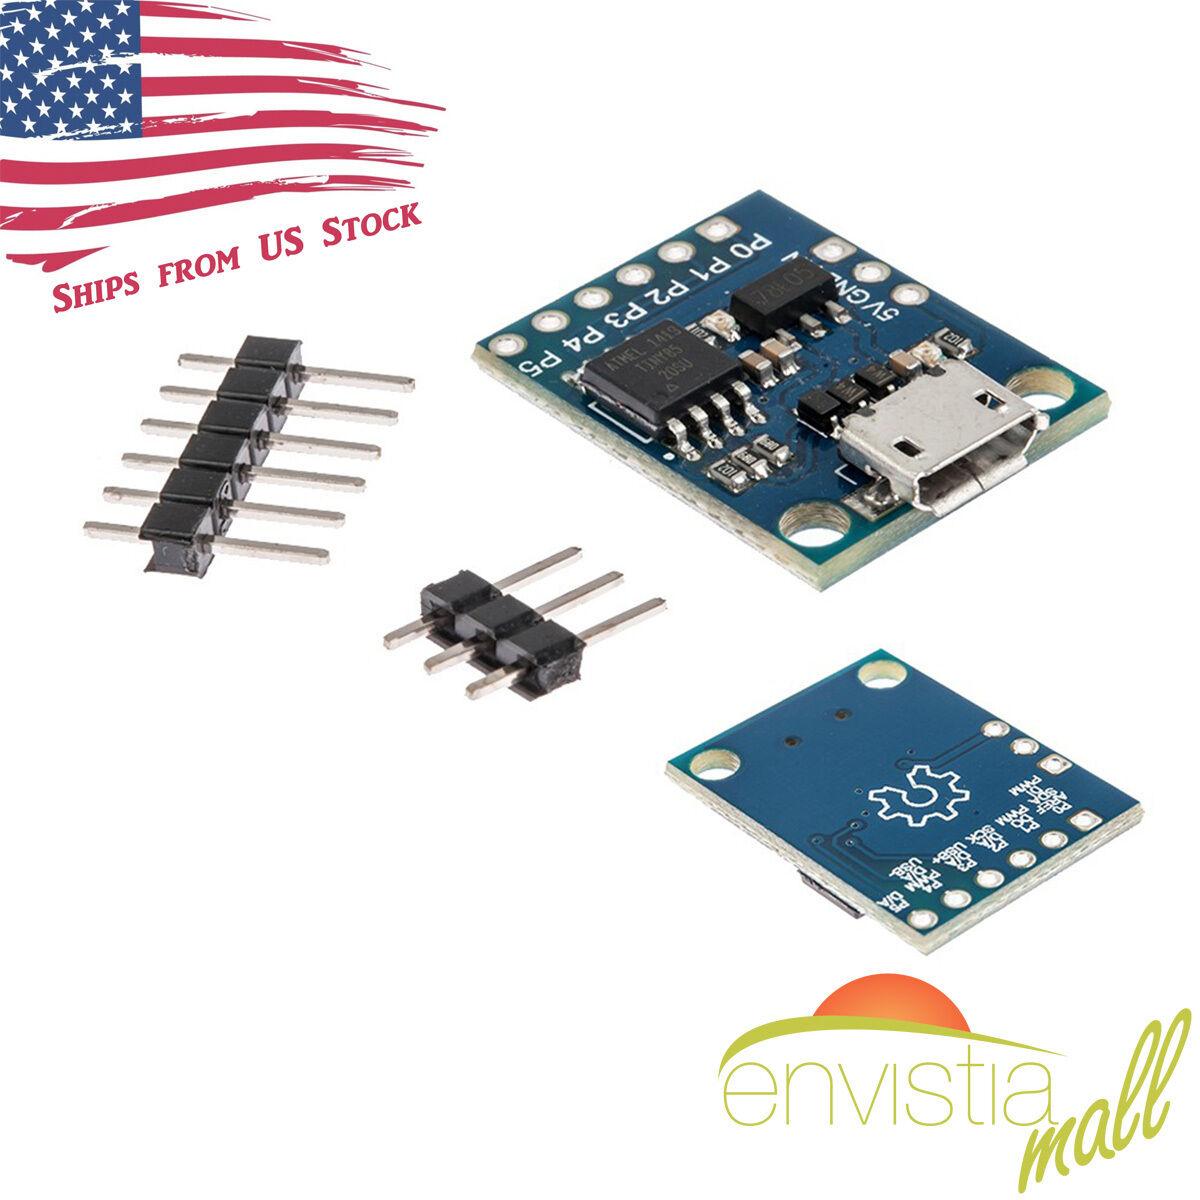 1AB8 Kickstarter 5V USB Micro ATTINY85 Development Boards Panel Kit Arduino